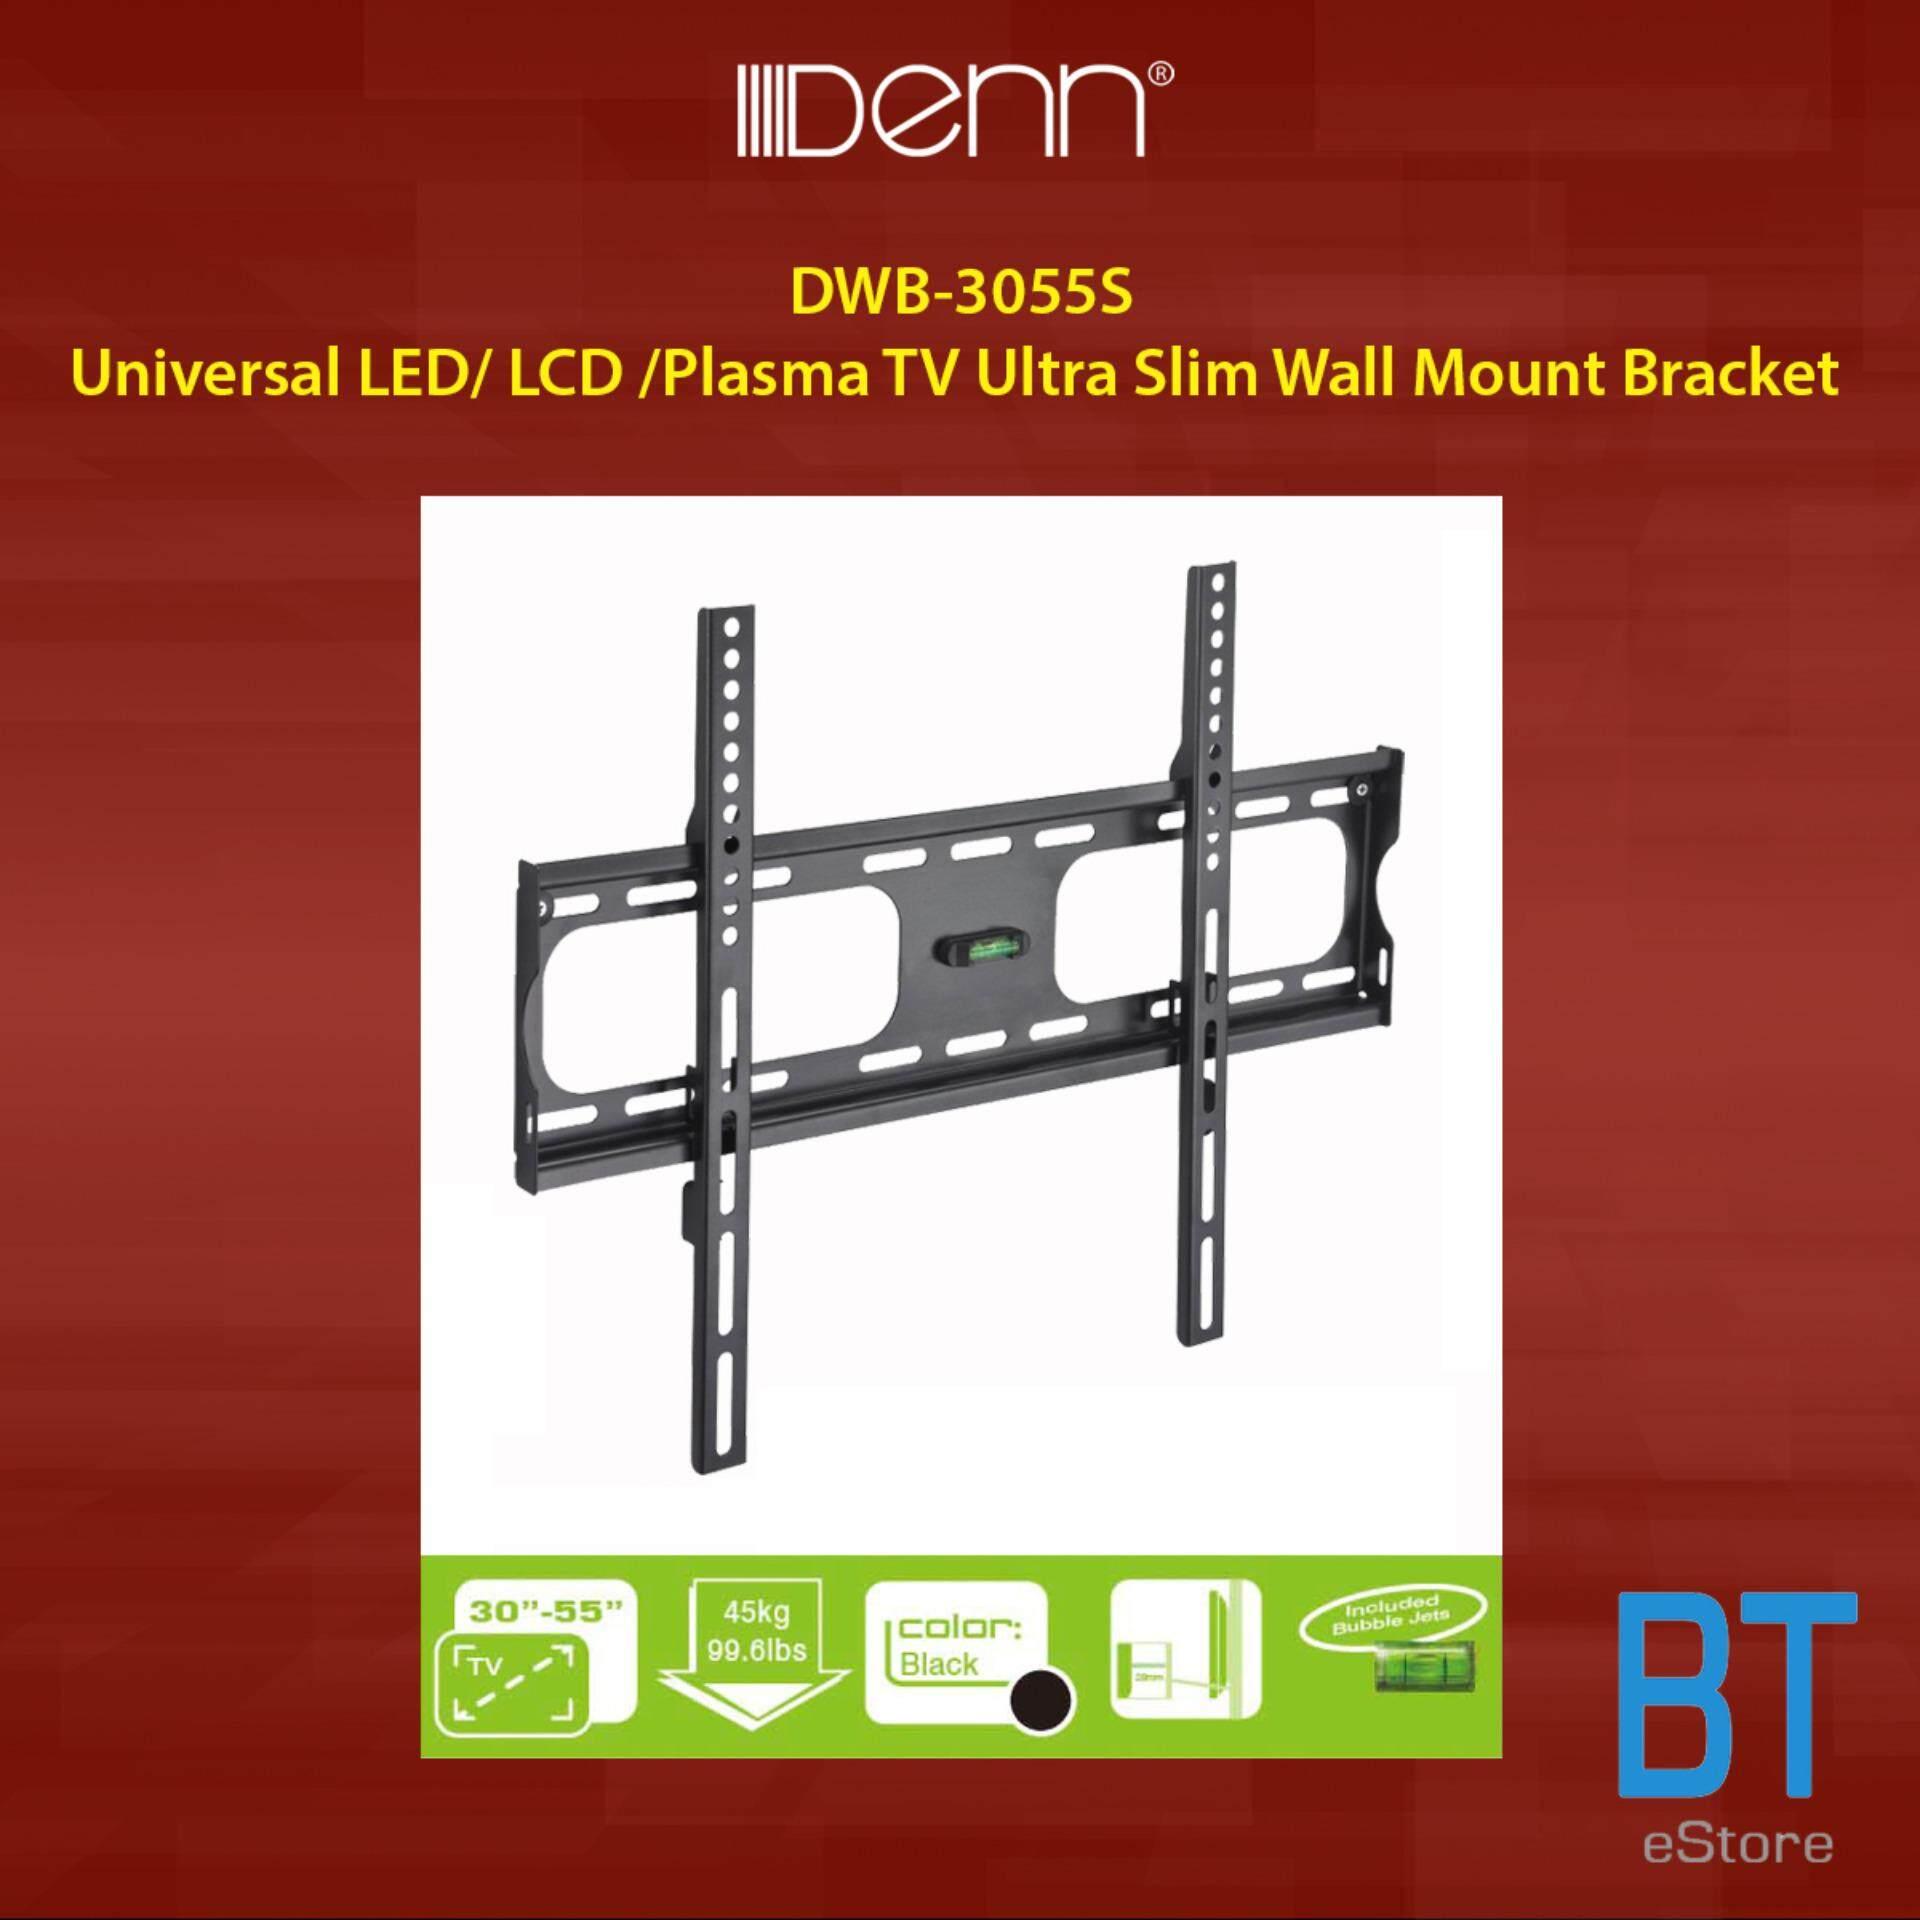 DENN DWB-3055S Universal LED/LCD/Plasma TV Ultra Slim Wall Mount Bracket